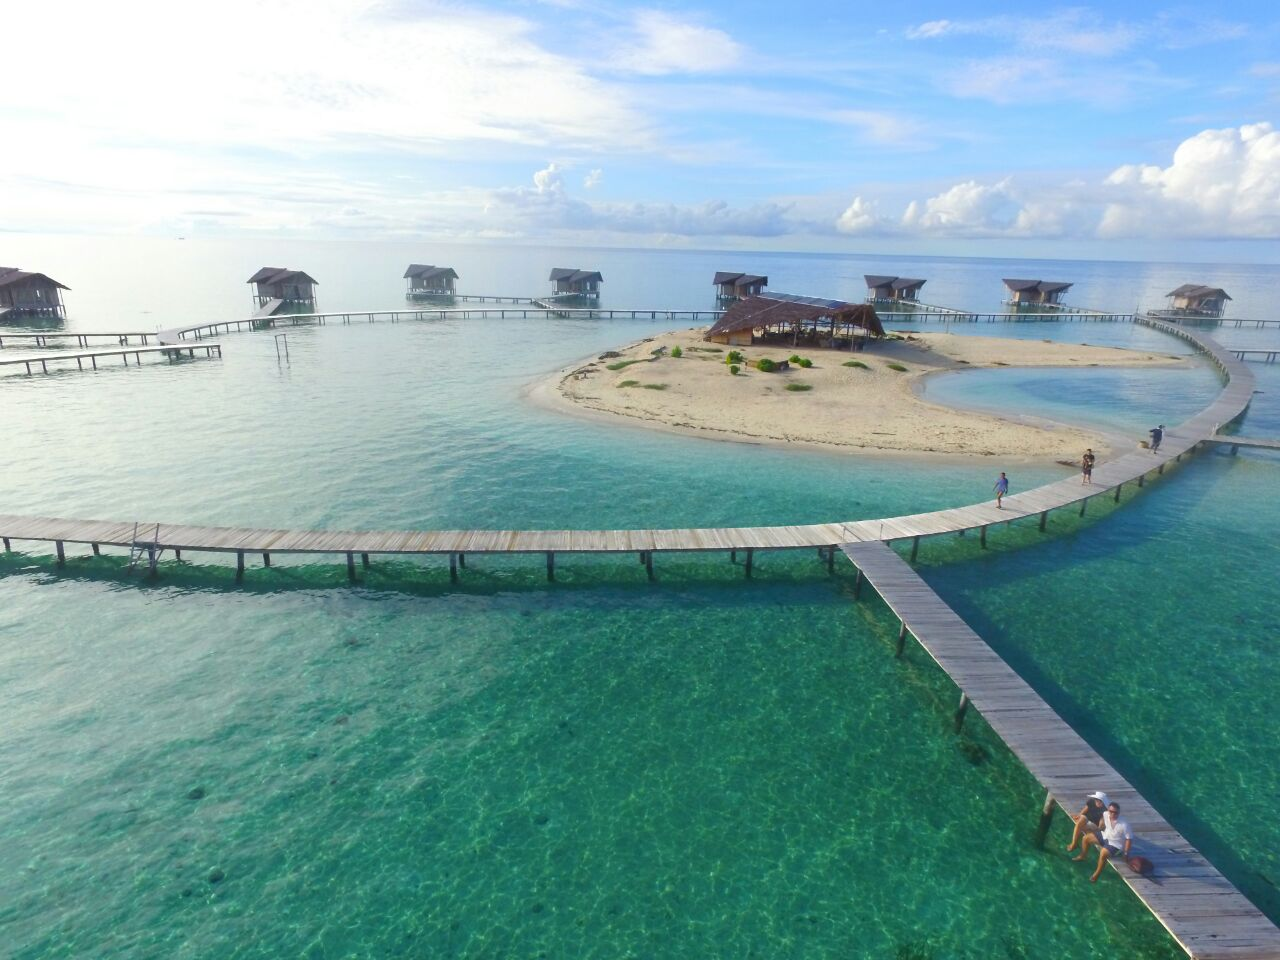 Pulau Cinta Maldives Gorontalo Indonesia Tukang Jalan Bagaimana Akses Pulo